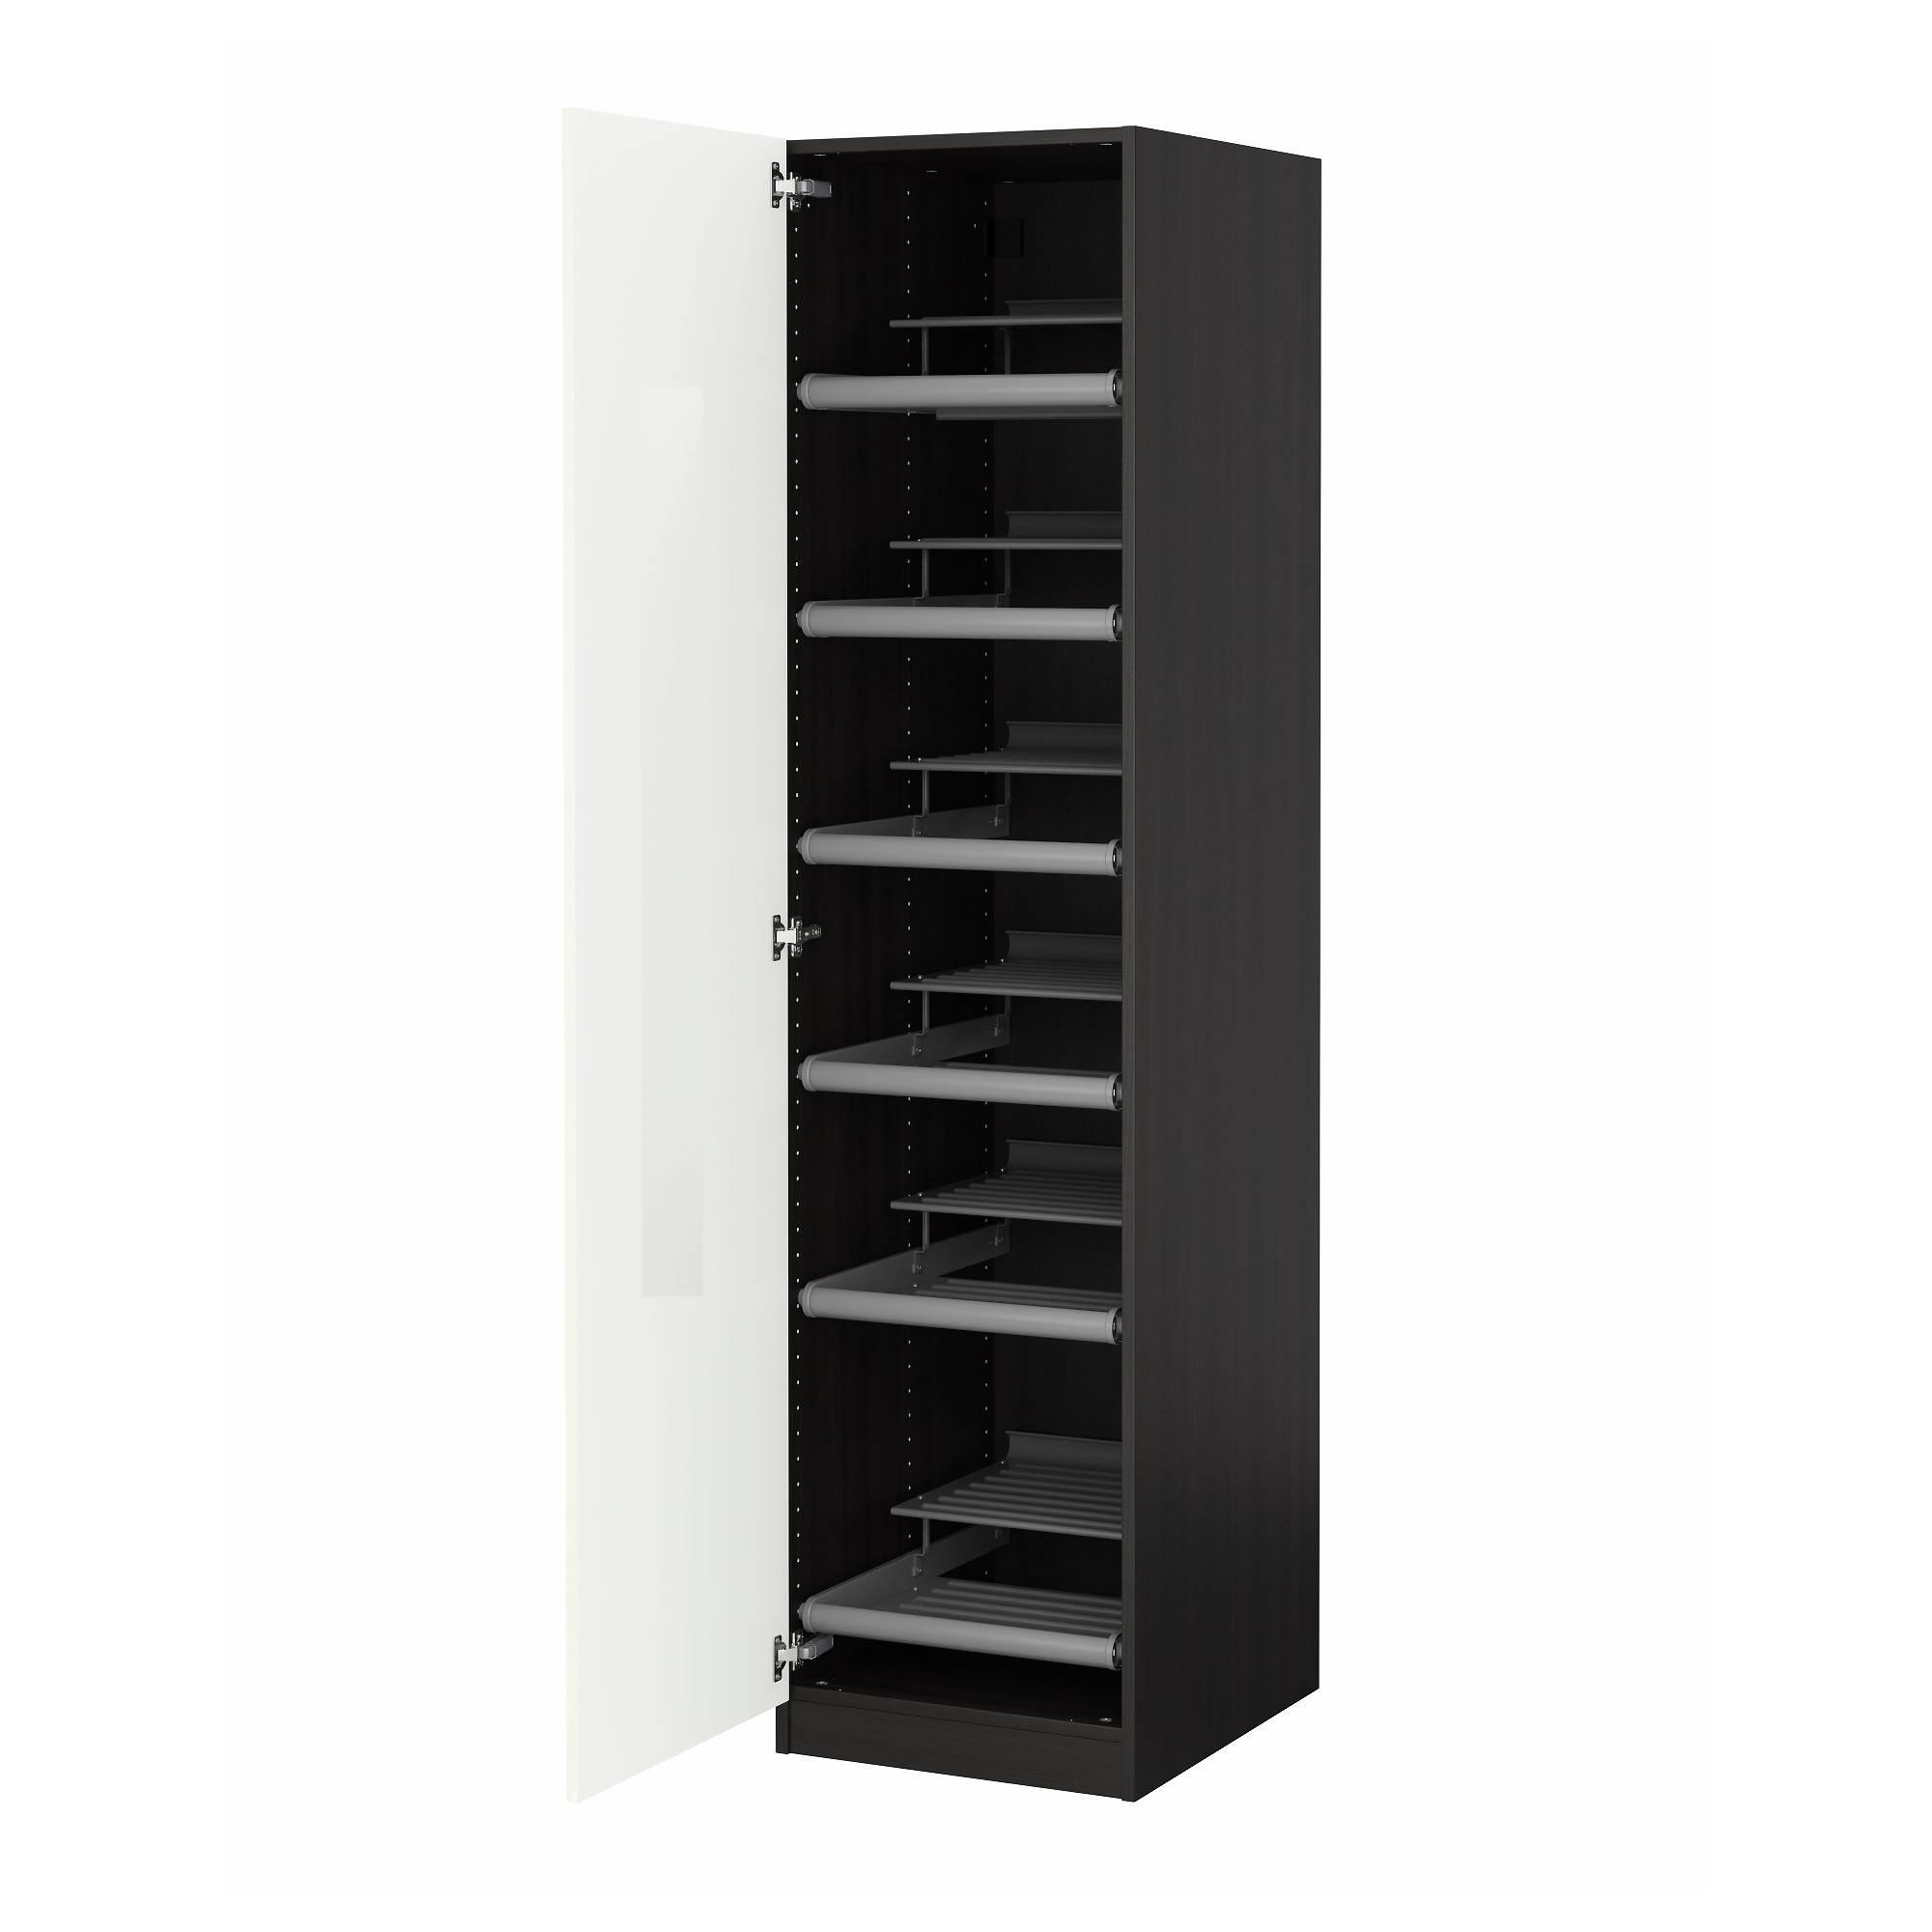 Pax Wardrobe Black-Brown/ballstad White 50X60X201 Cm - Ikea throughout Black Wardrobes (Image 8 of 15)